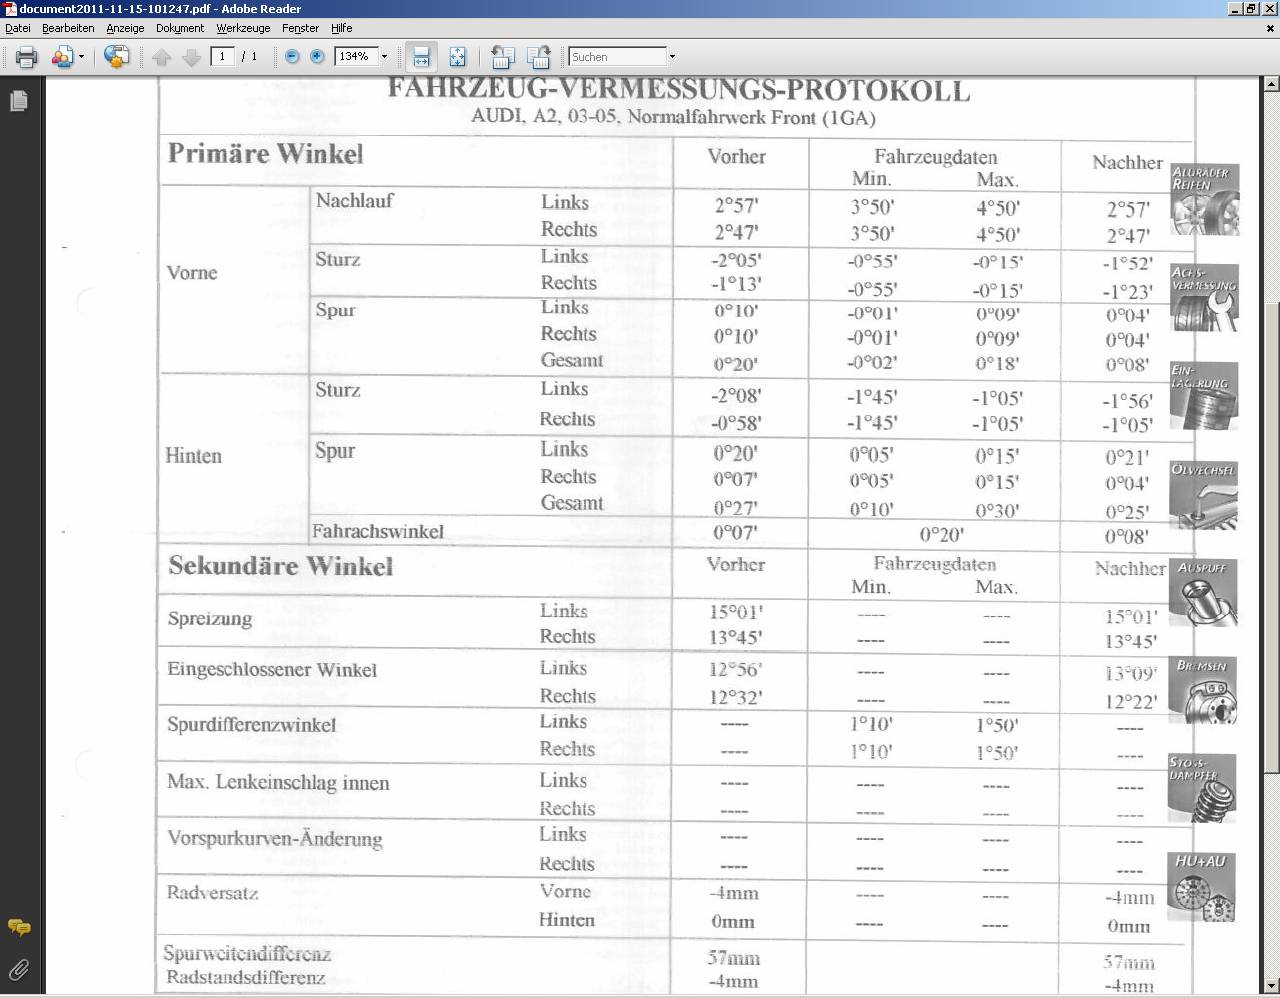 Protokoll.jpg.5d0a7a041c8feb1619a171d3a9dba10c.jpg